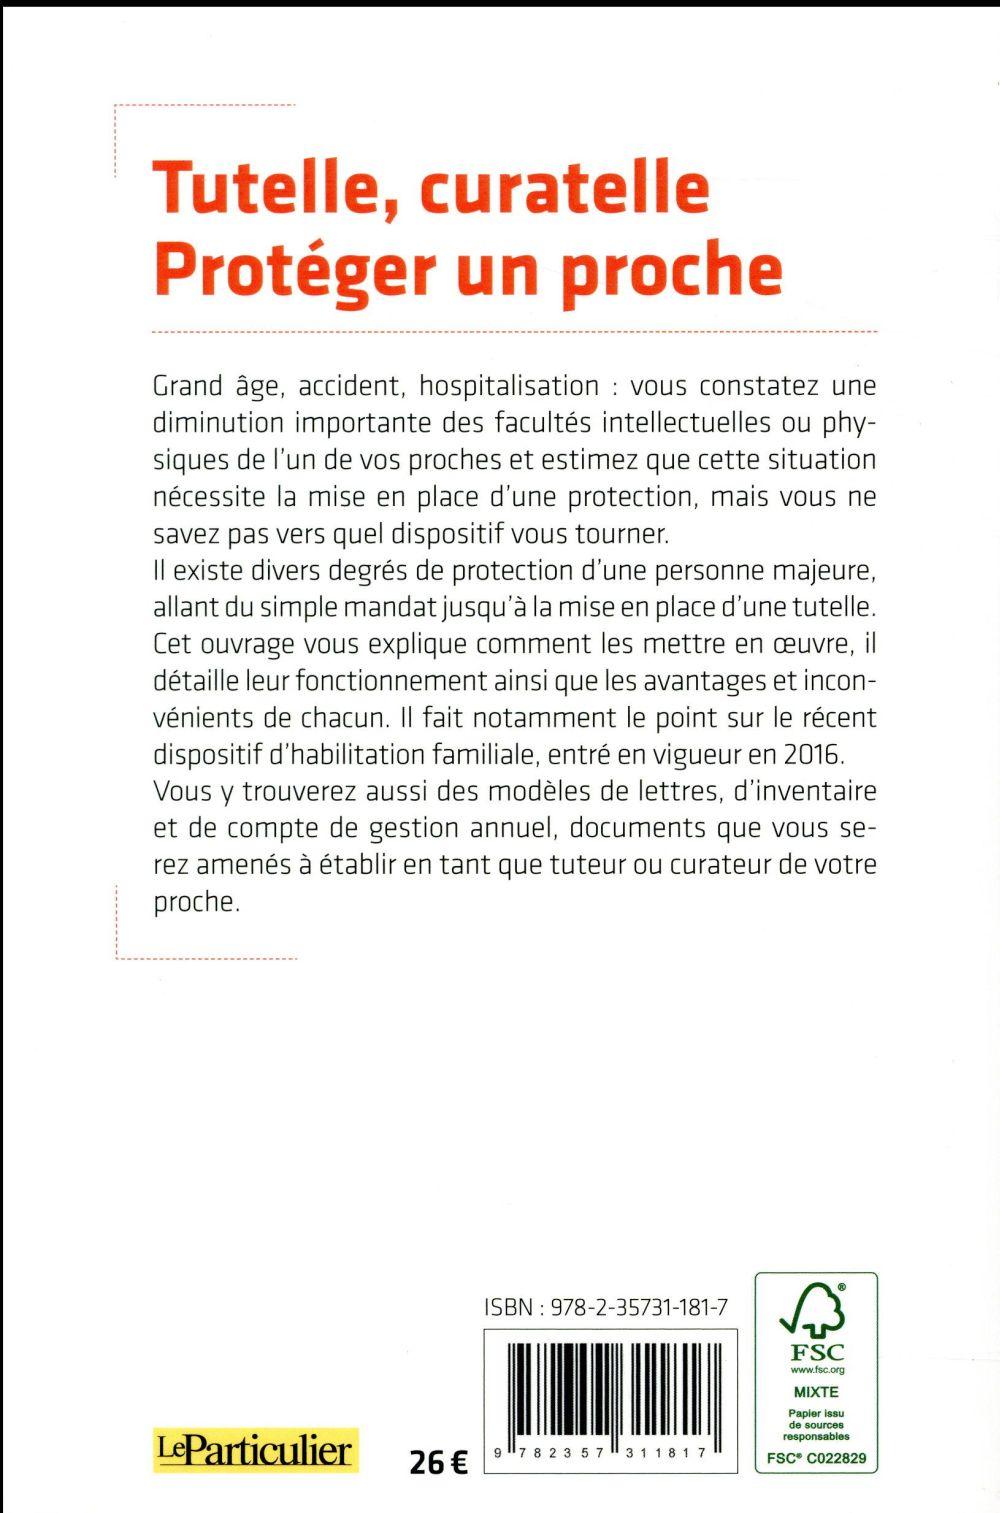 Tutelle Curatelle Proteger Un Proche Edition 2017 Collectif